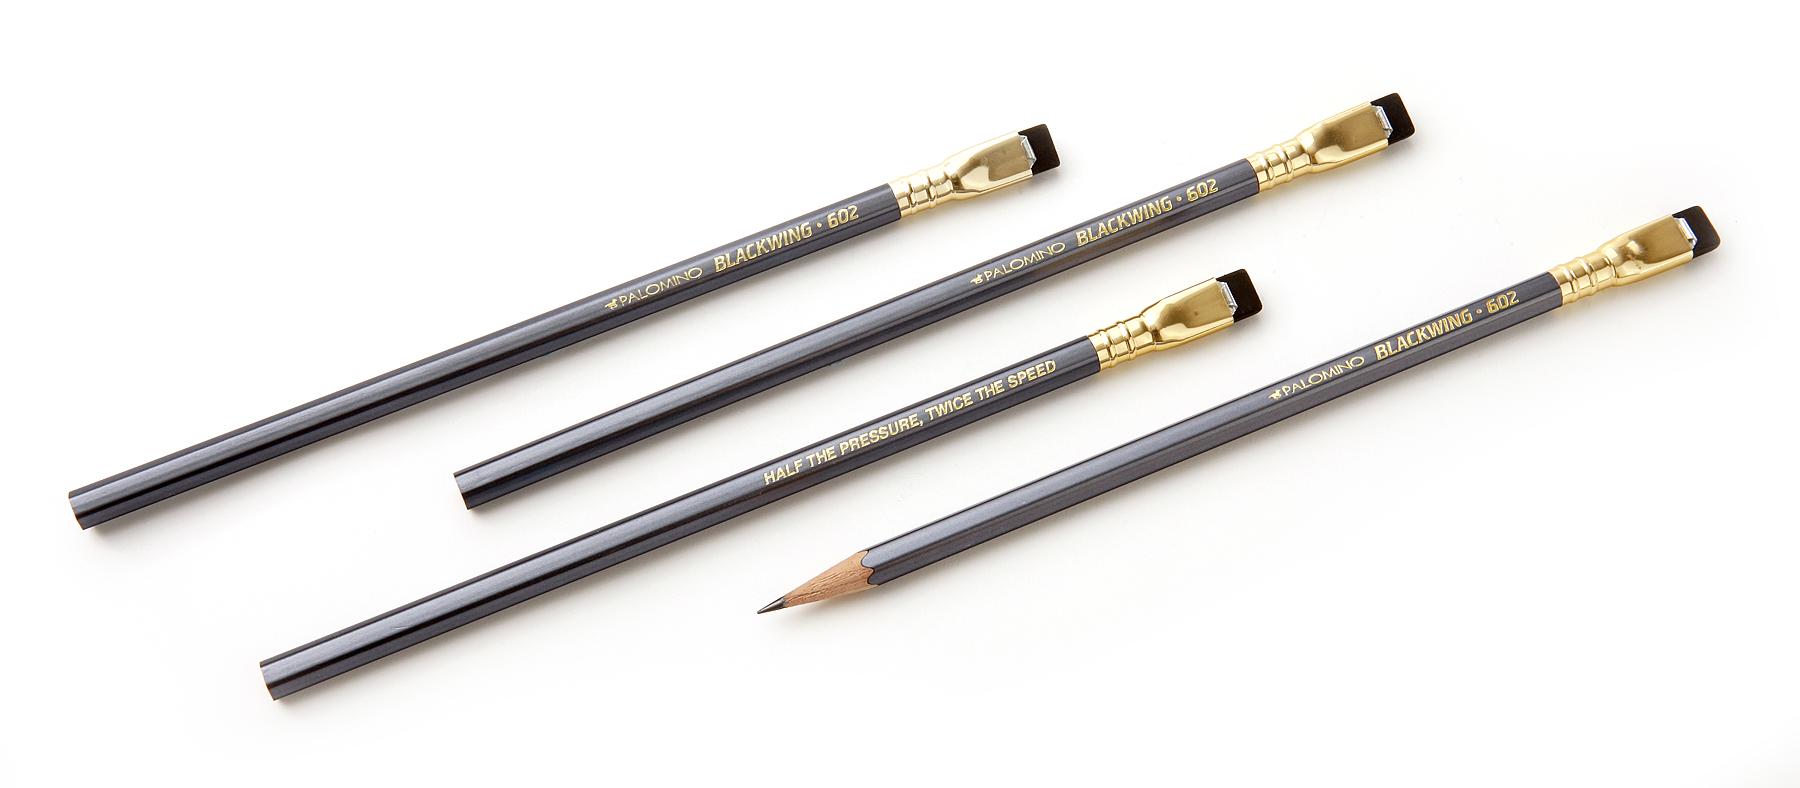 Available for $21.95 per dozen at Pencils.com.